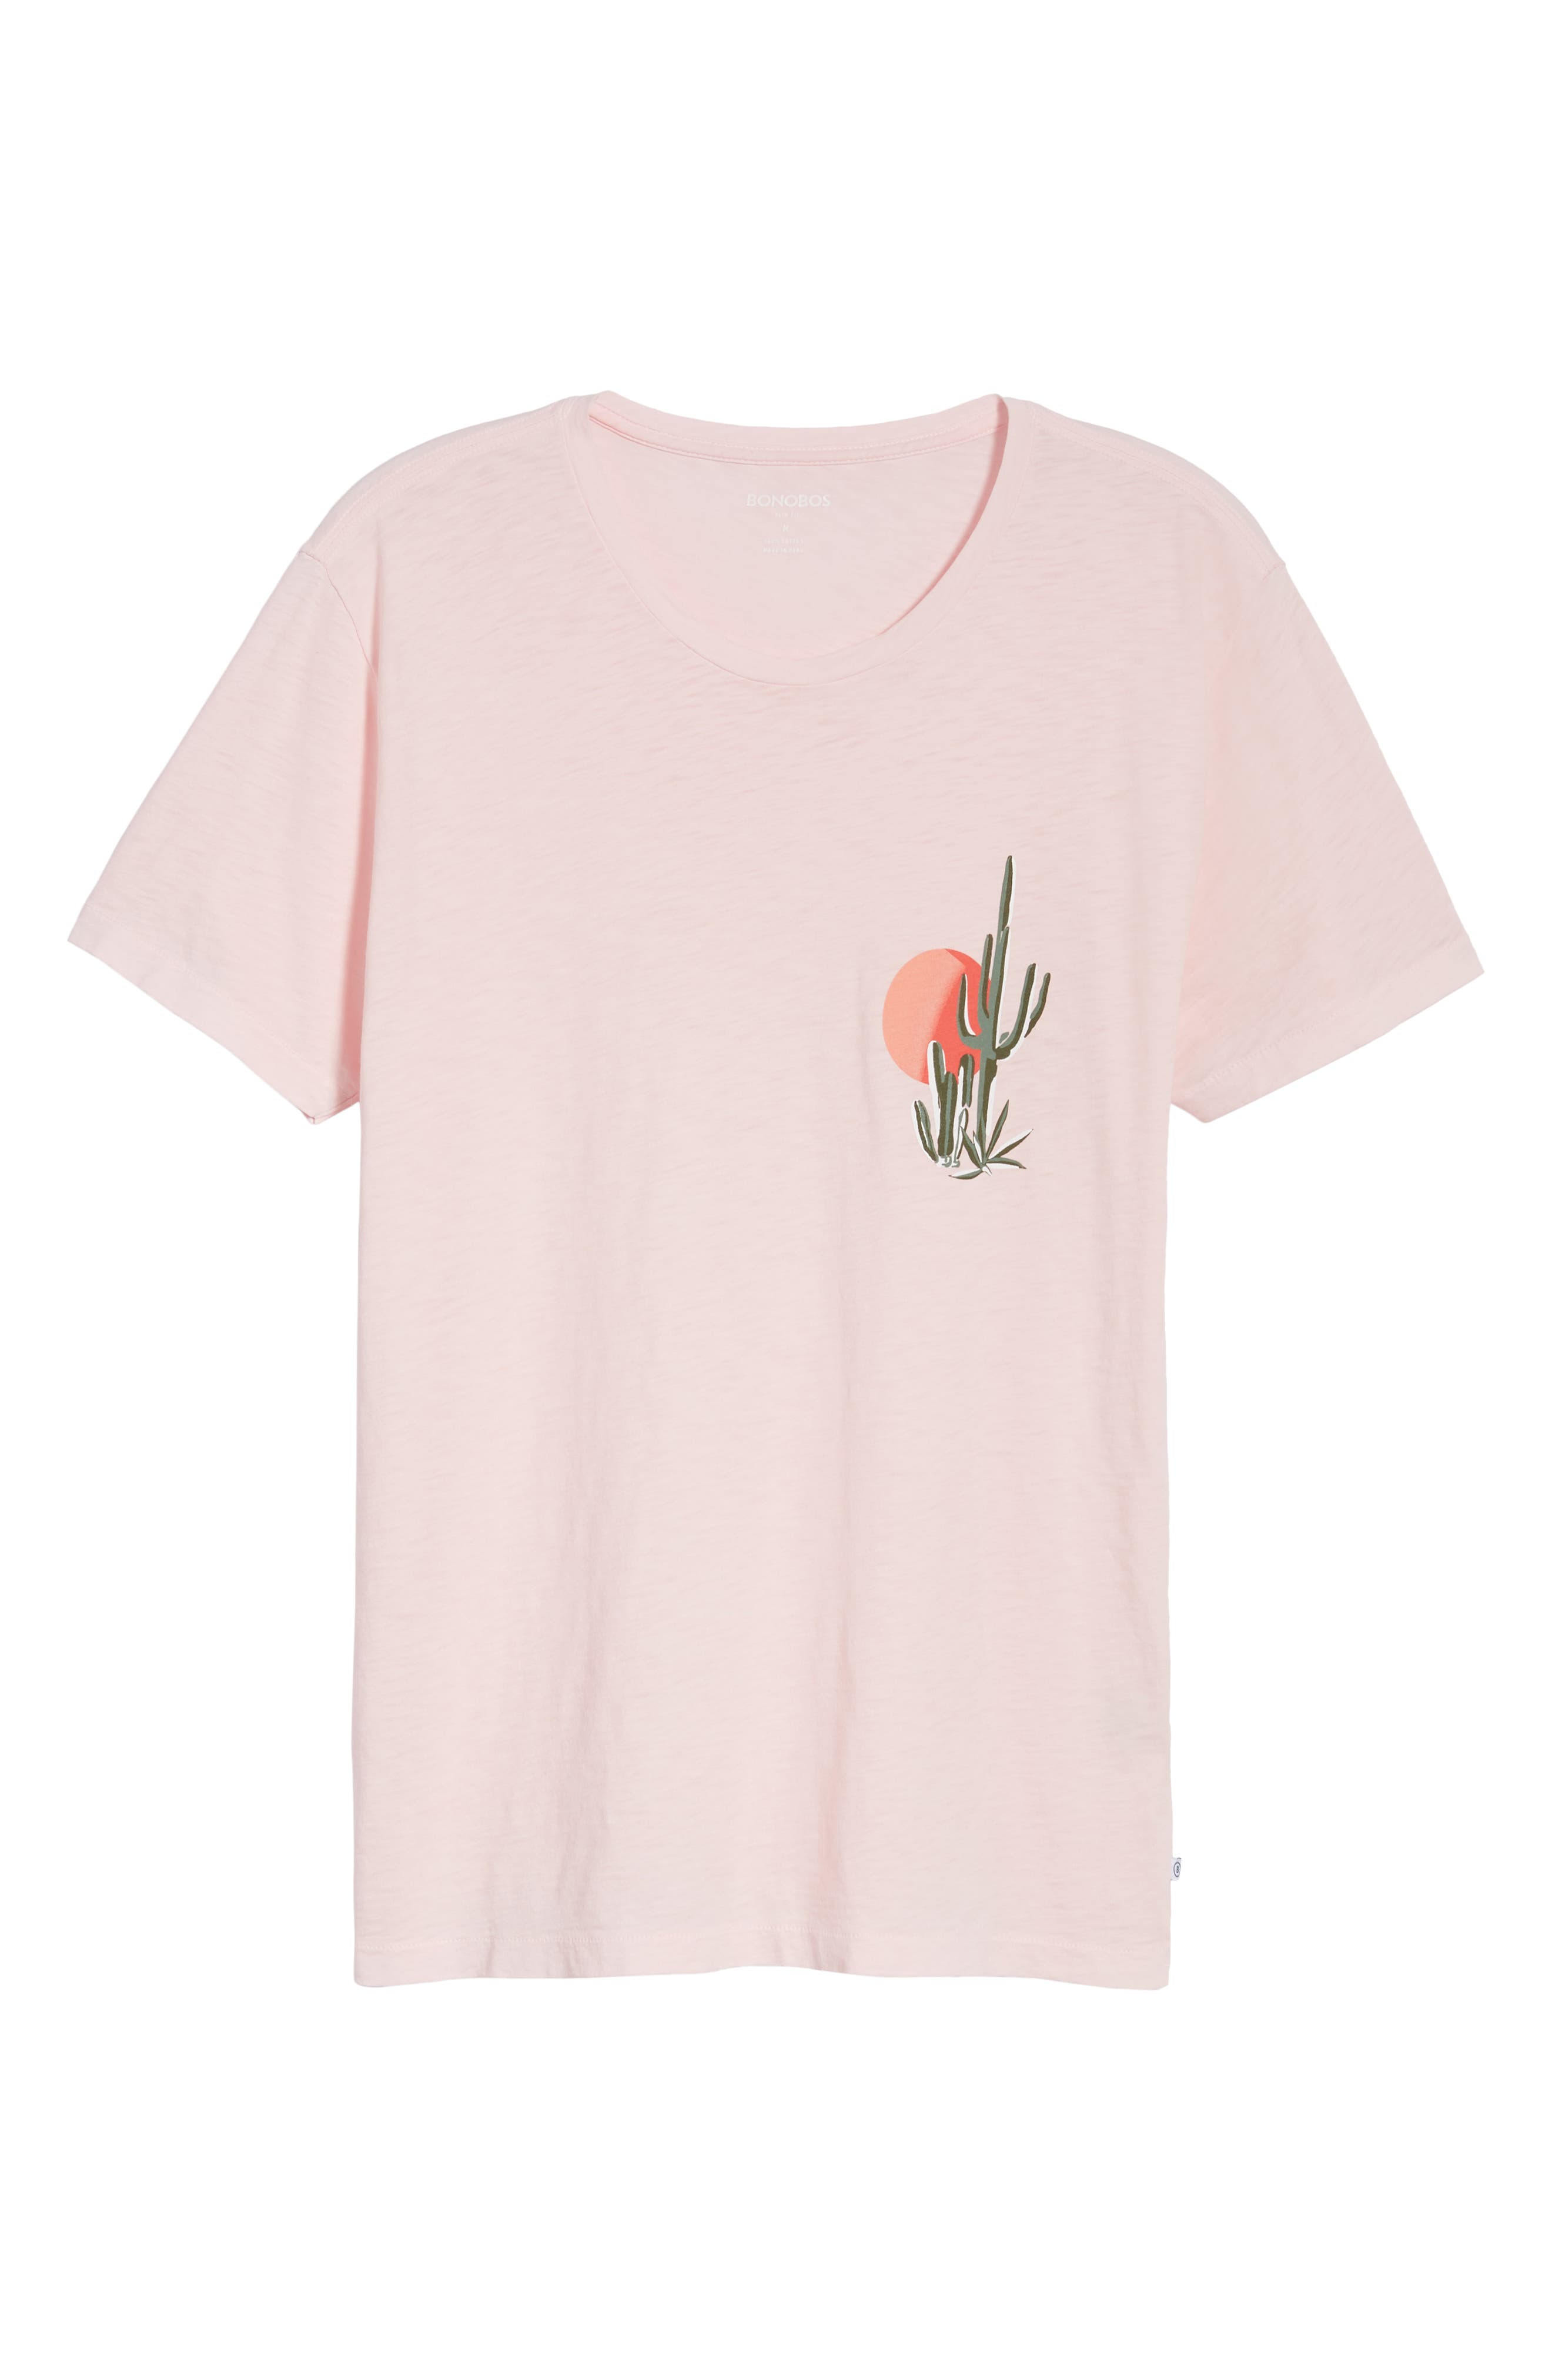 Cactus Sunset Slim Fit T-Shirt,                             Alternate thumbnail 6, color,                             Skivvy Pink